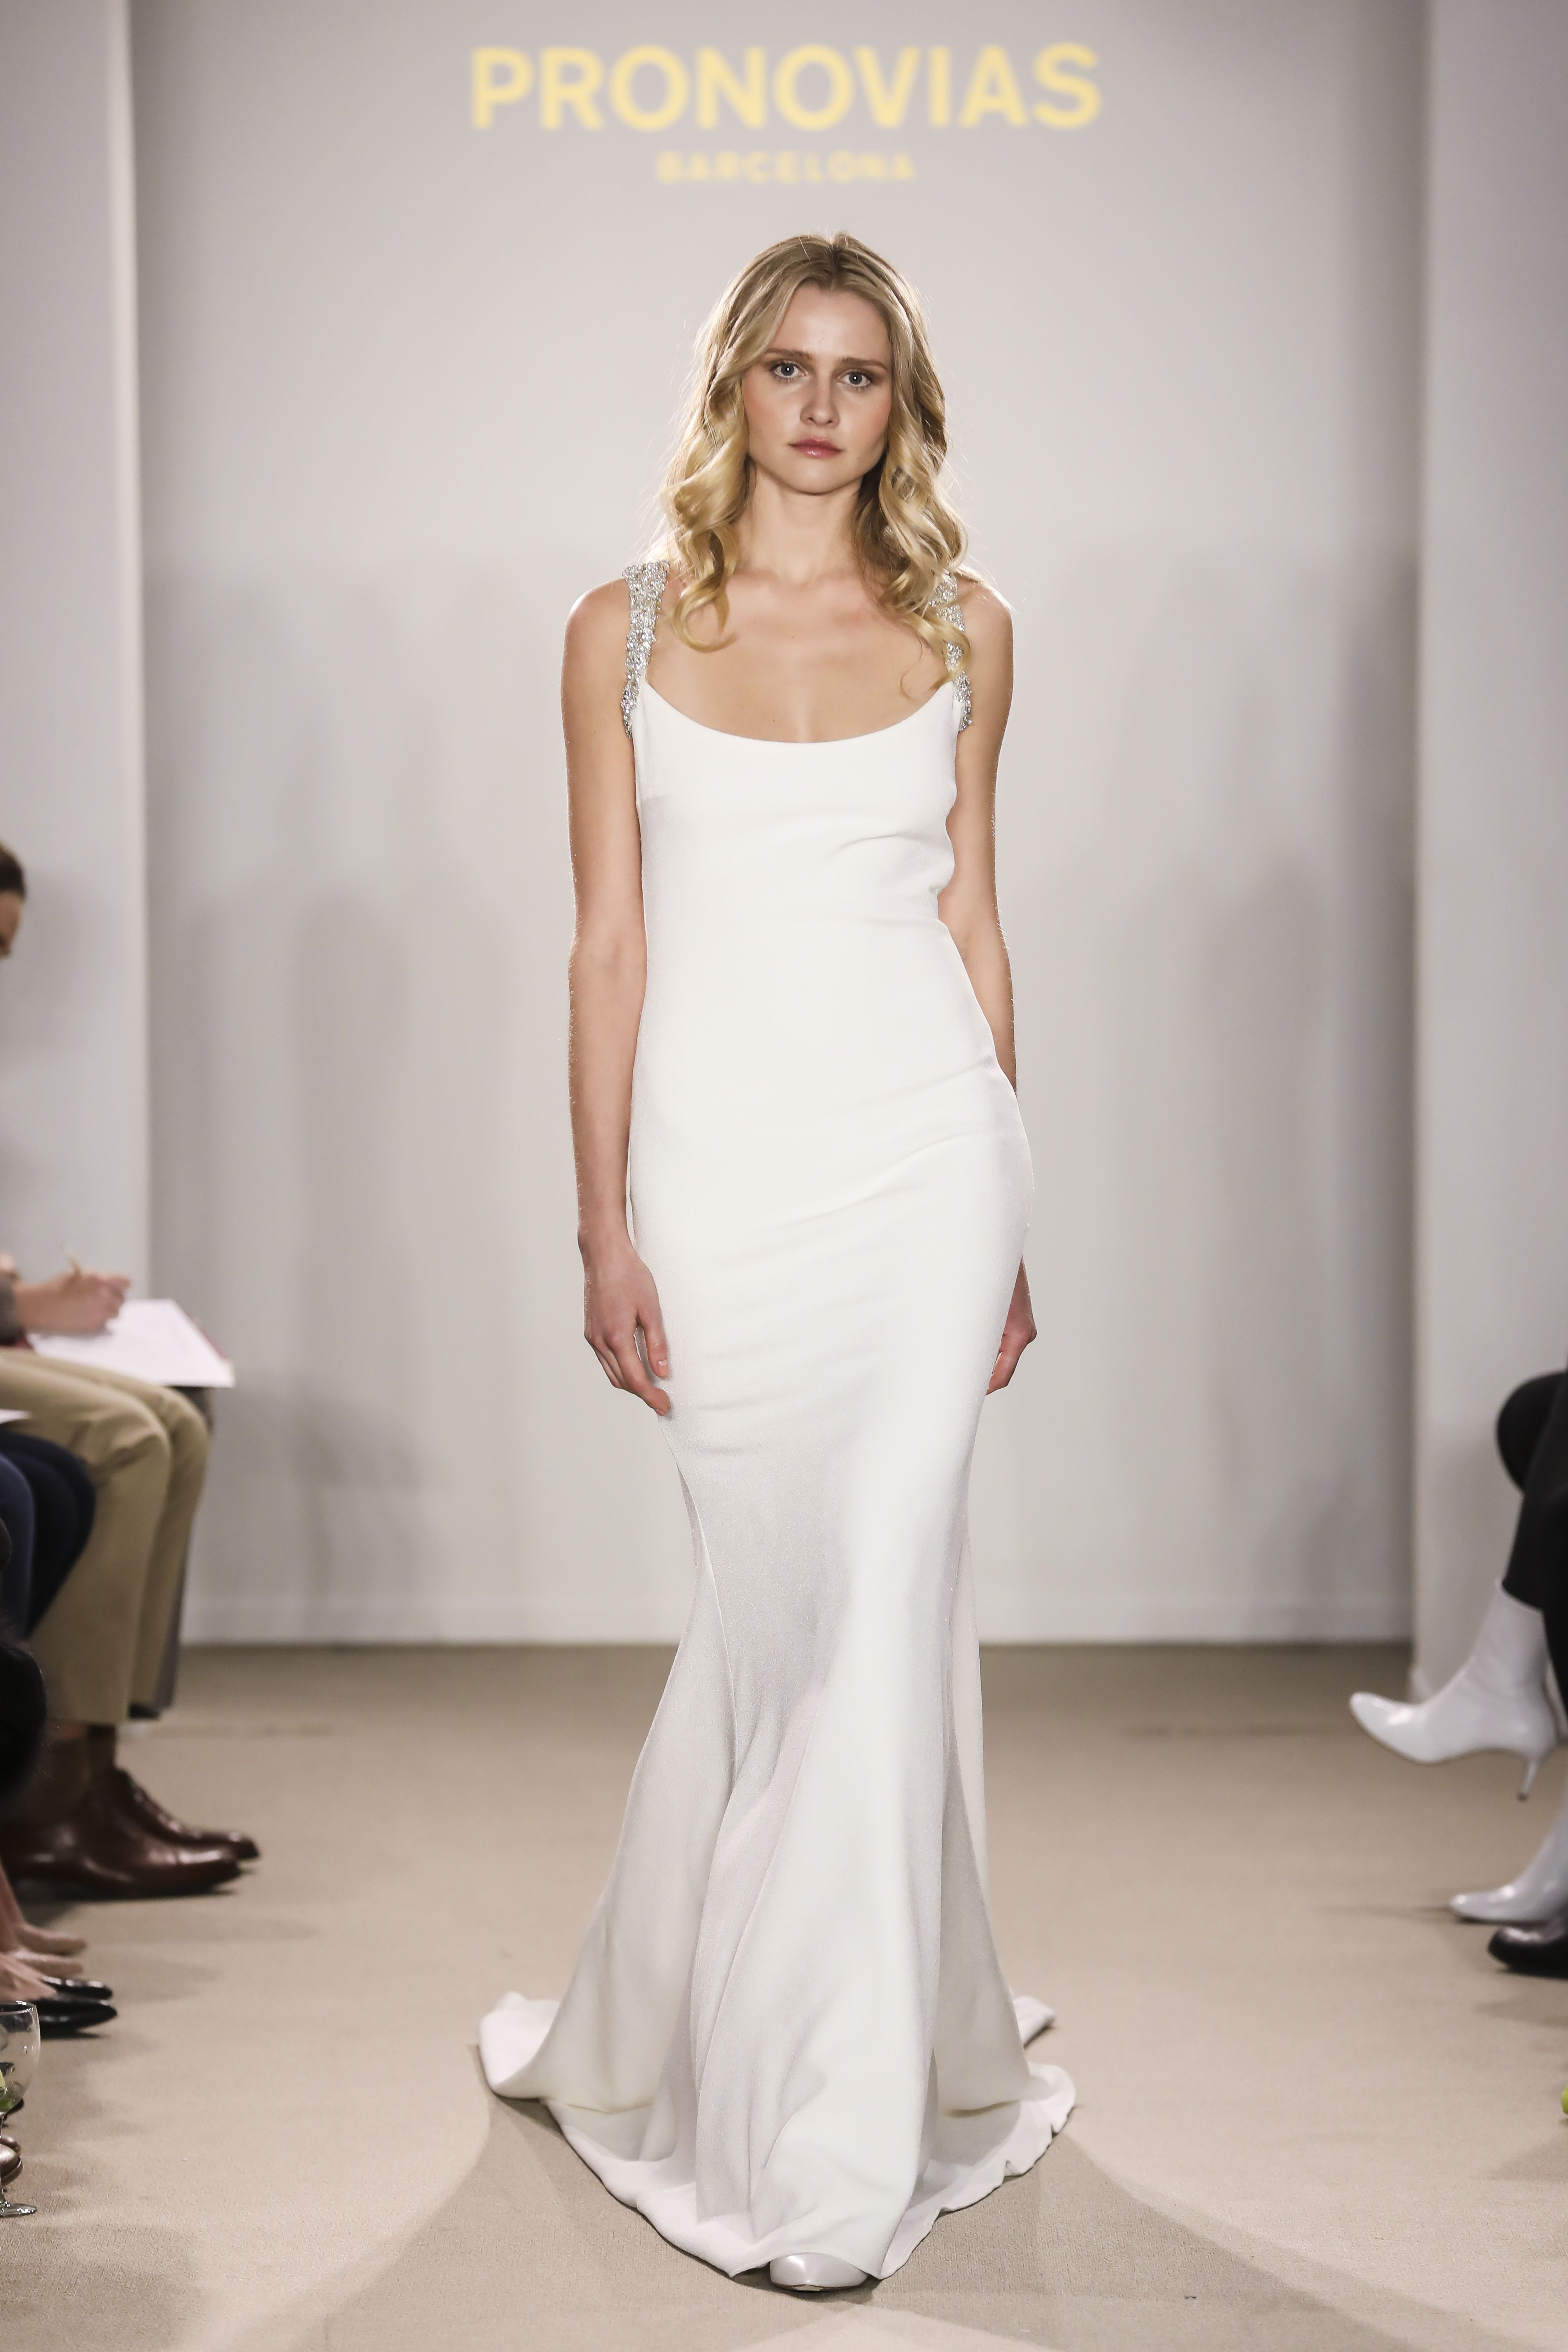 c46a02c251603 Rafia from the Atelier Pronovias 2018 Preview Collection Modern Minimalist  Wedding, Pronovias Dresses, Atelier